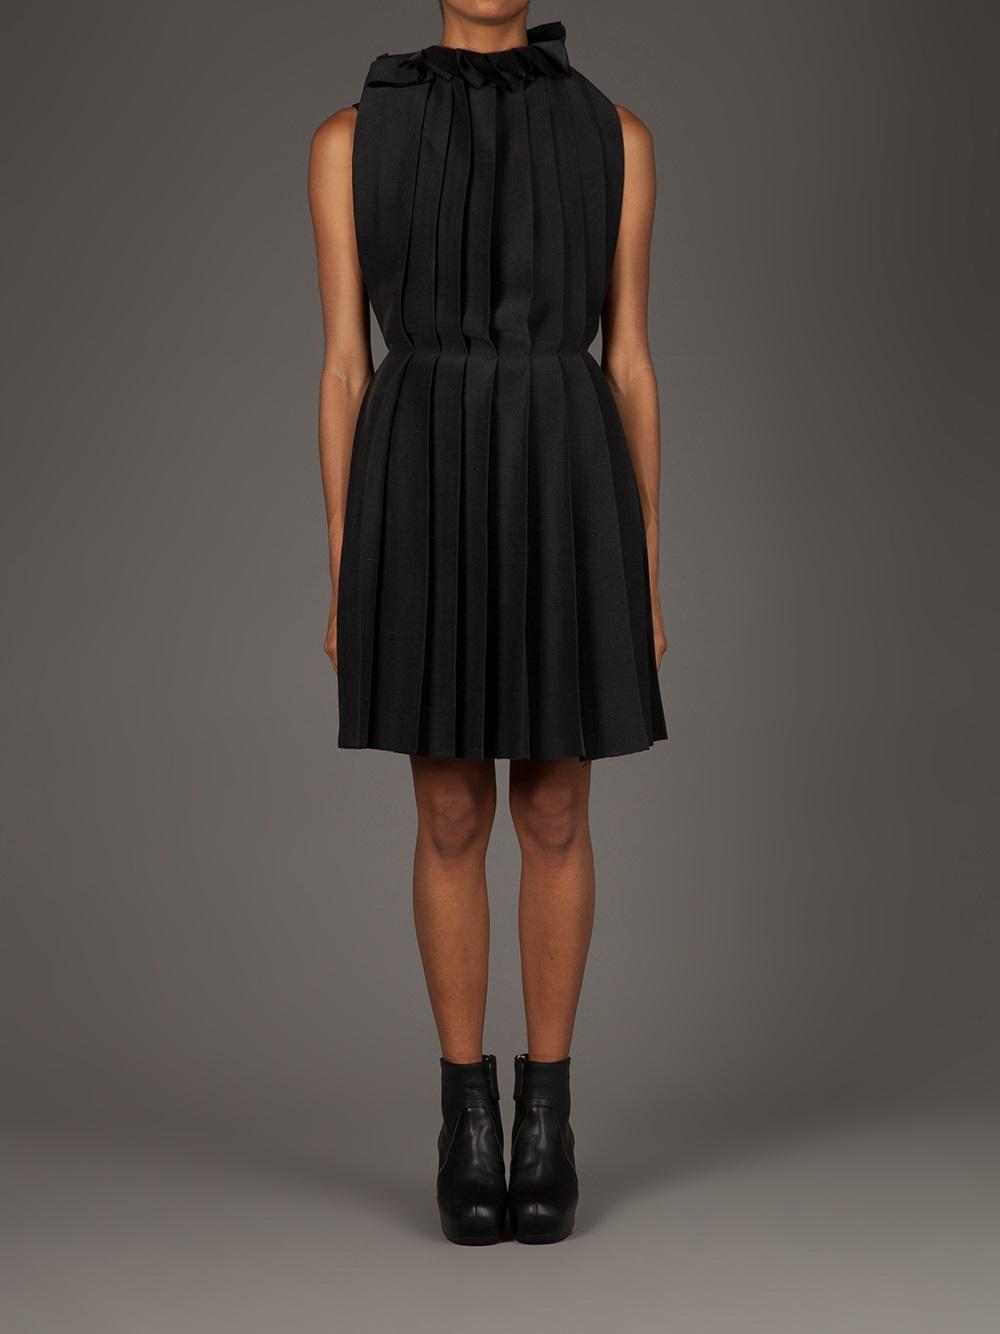 Lyst Uma Wang Pleated Apron Dress In Black